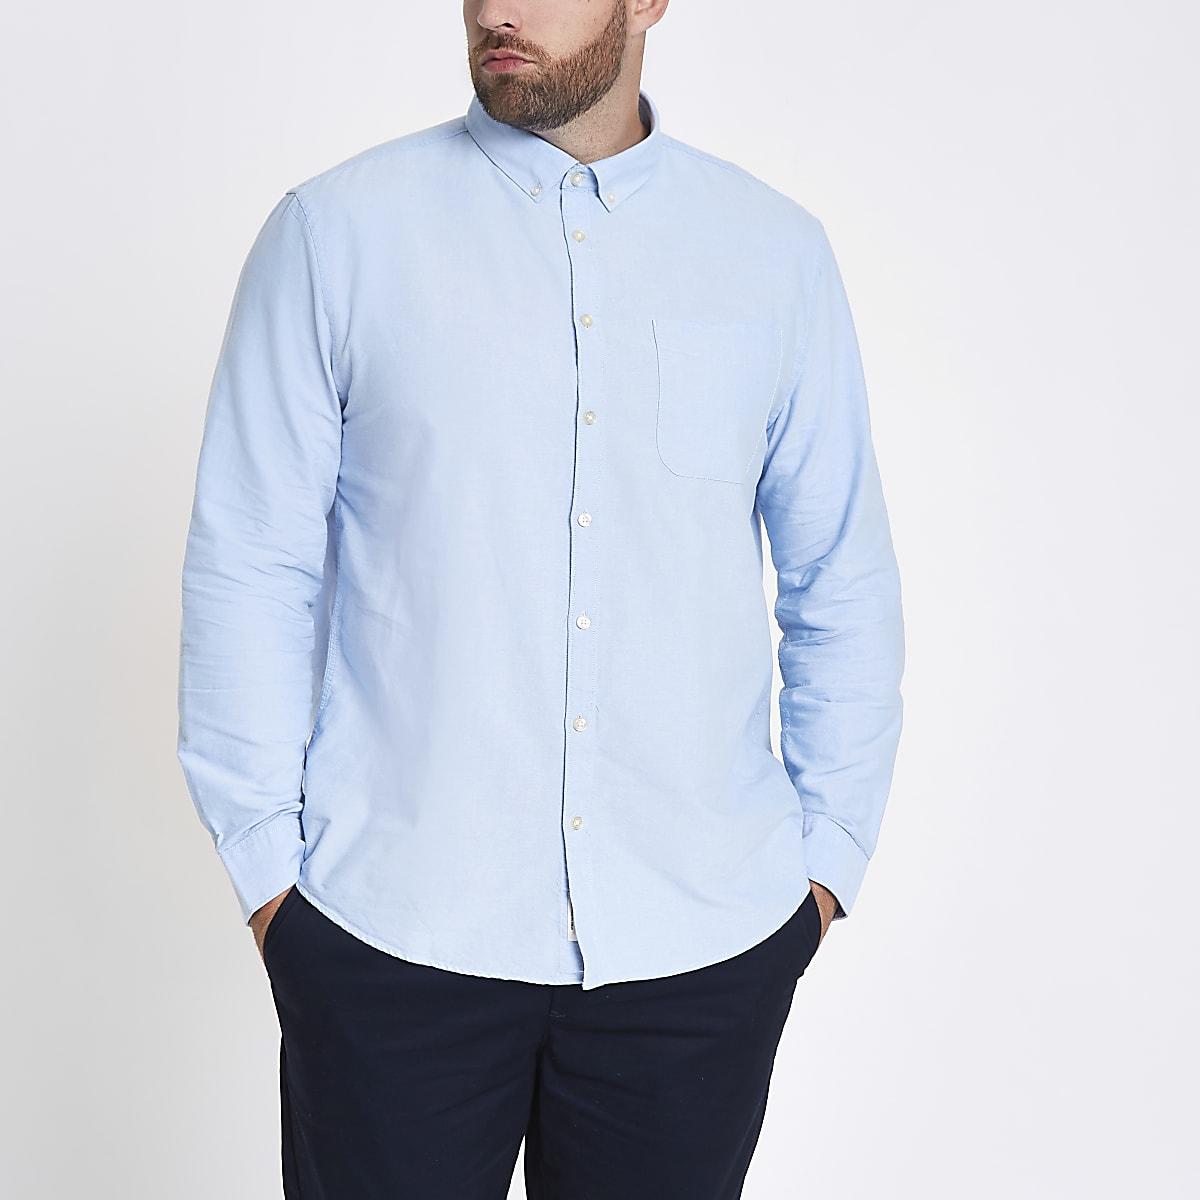 Big & Tall – Chemise bleu clair à manches longues